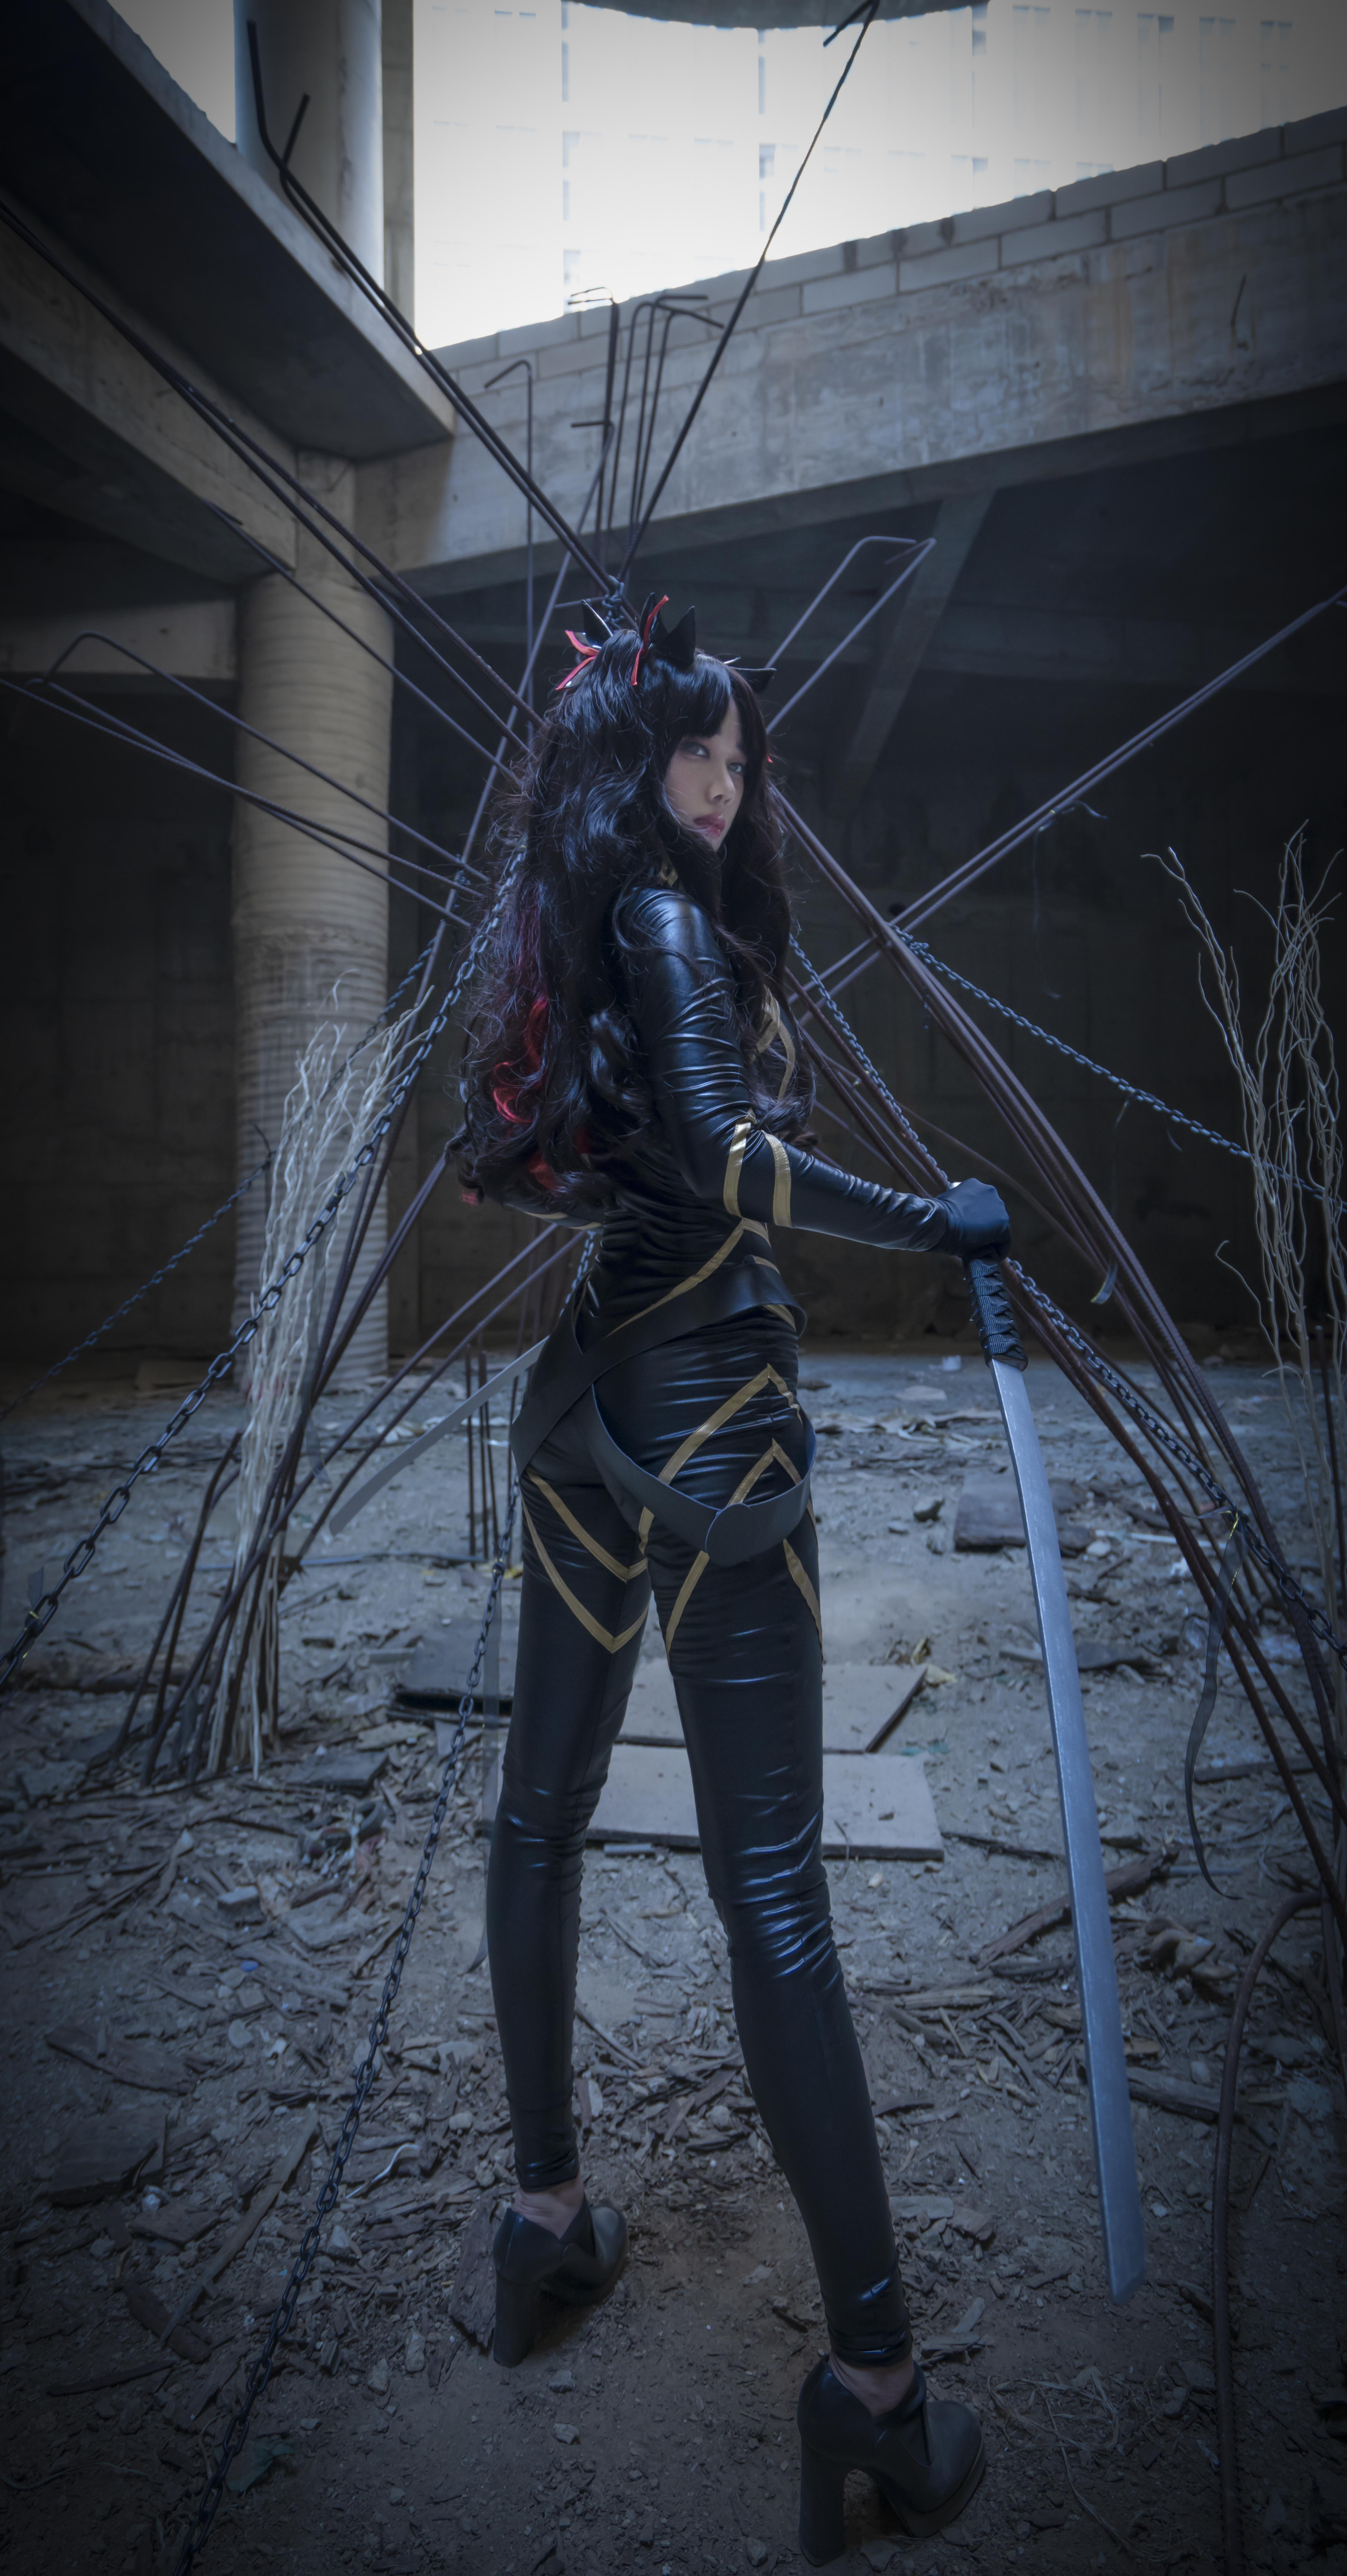 《FATE/GRAND ORDER》远坂凛cosplay【CN:七夜喵】-第7张